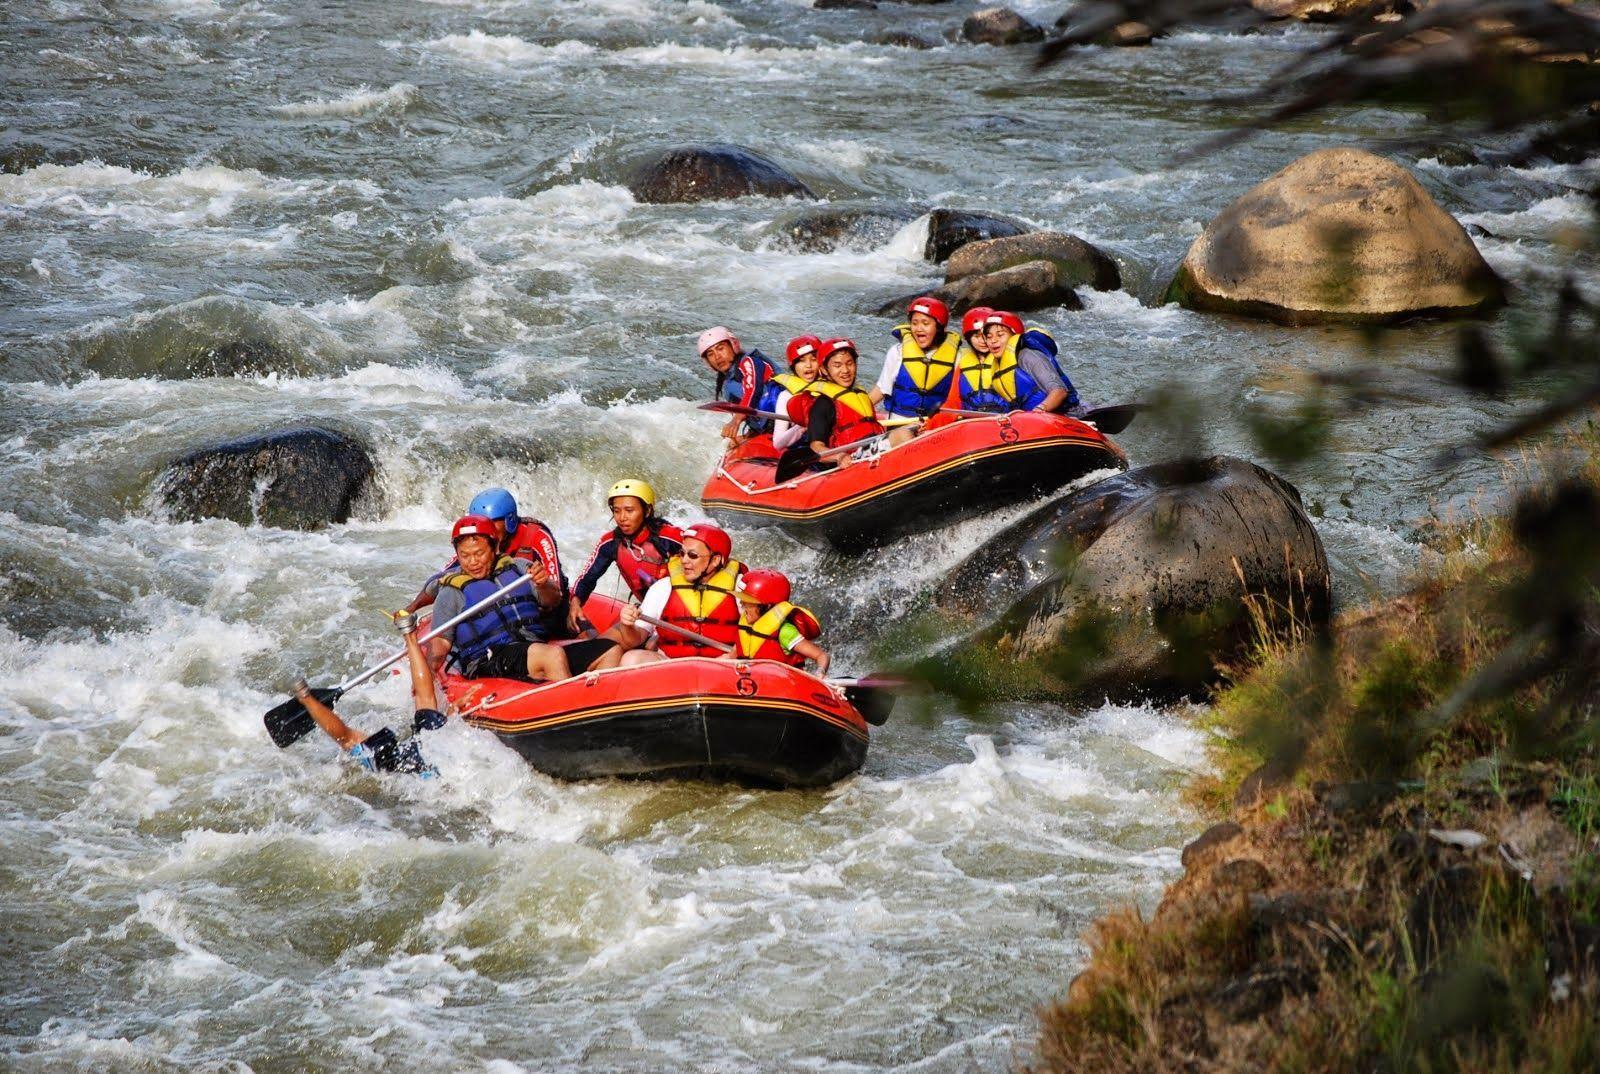 Hasil gambar untuk Kelas Pemula River Rafting Adventure